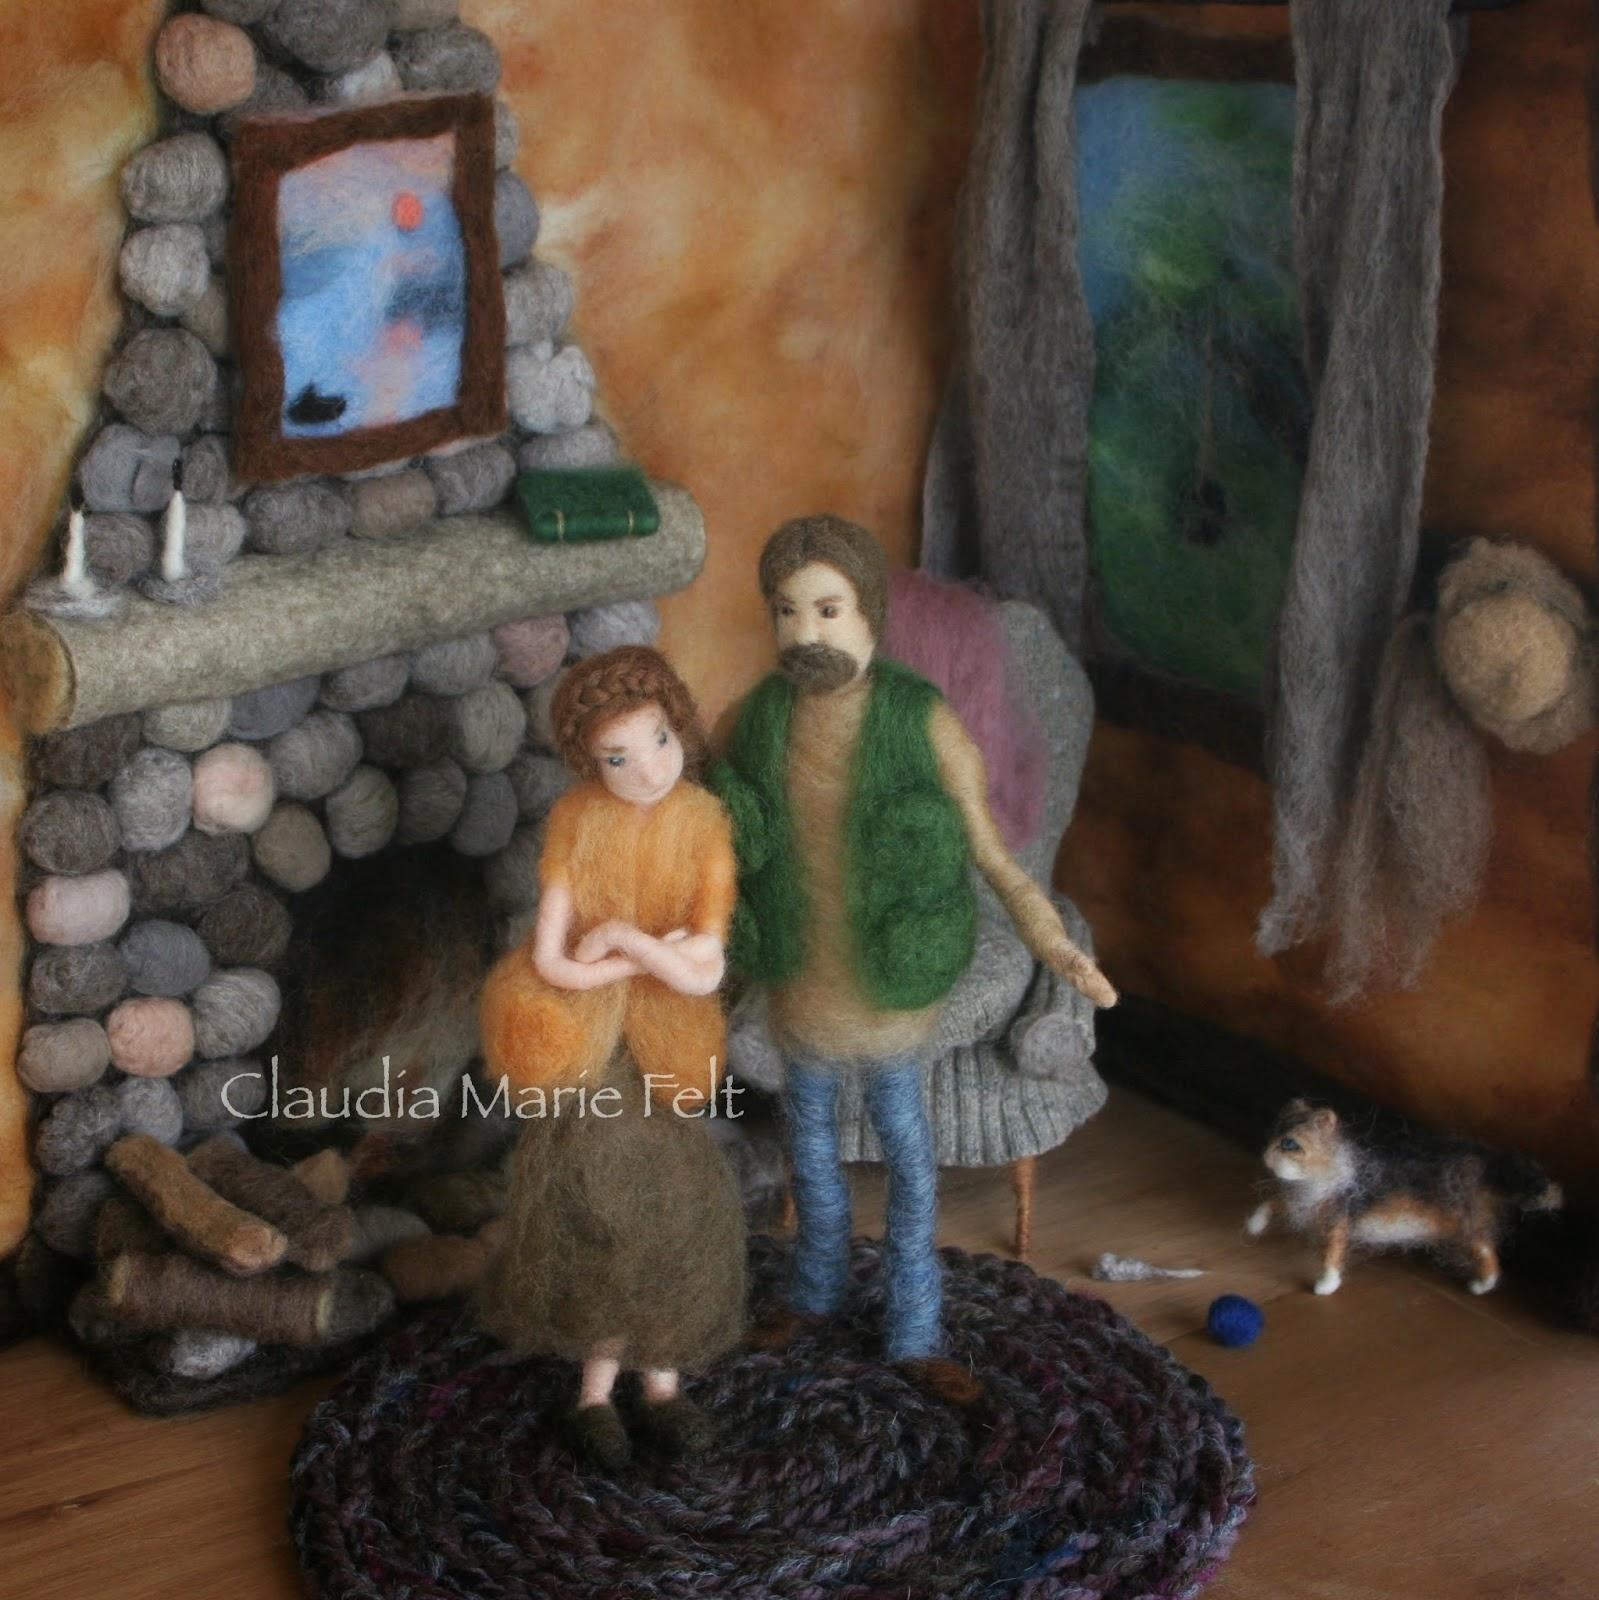 Hansel & Gretel fairy tale illustrated in fiber art